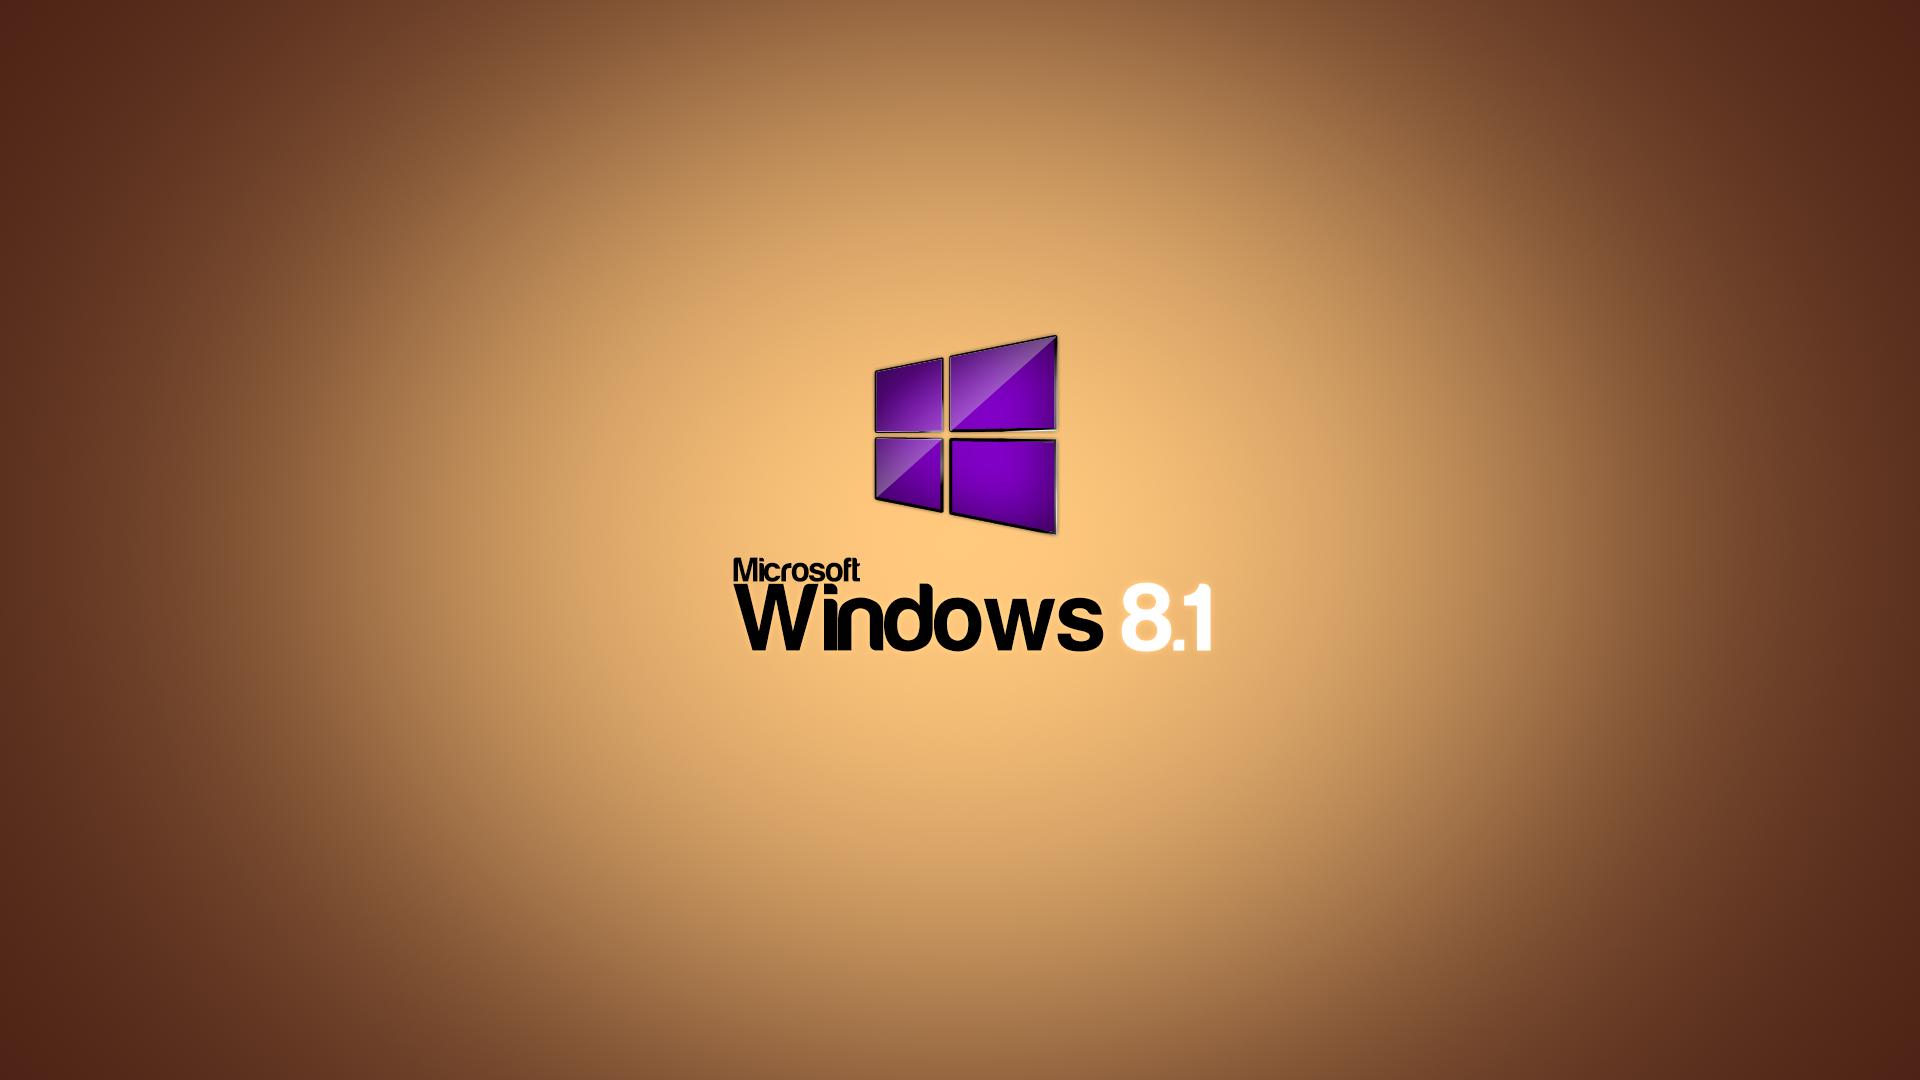 Windows 8 Wallpapers Release: Download Wallpaper Windows 8.1 Full HD Gallery